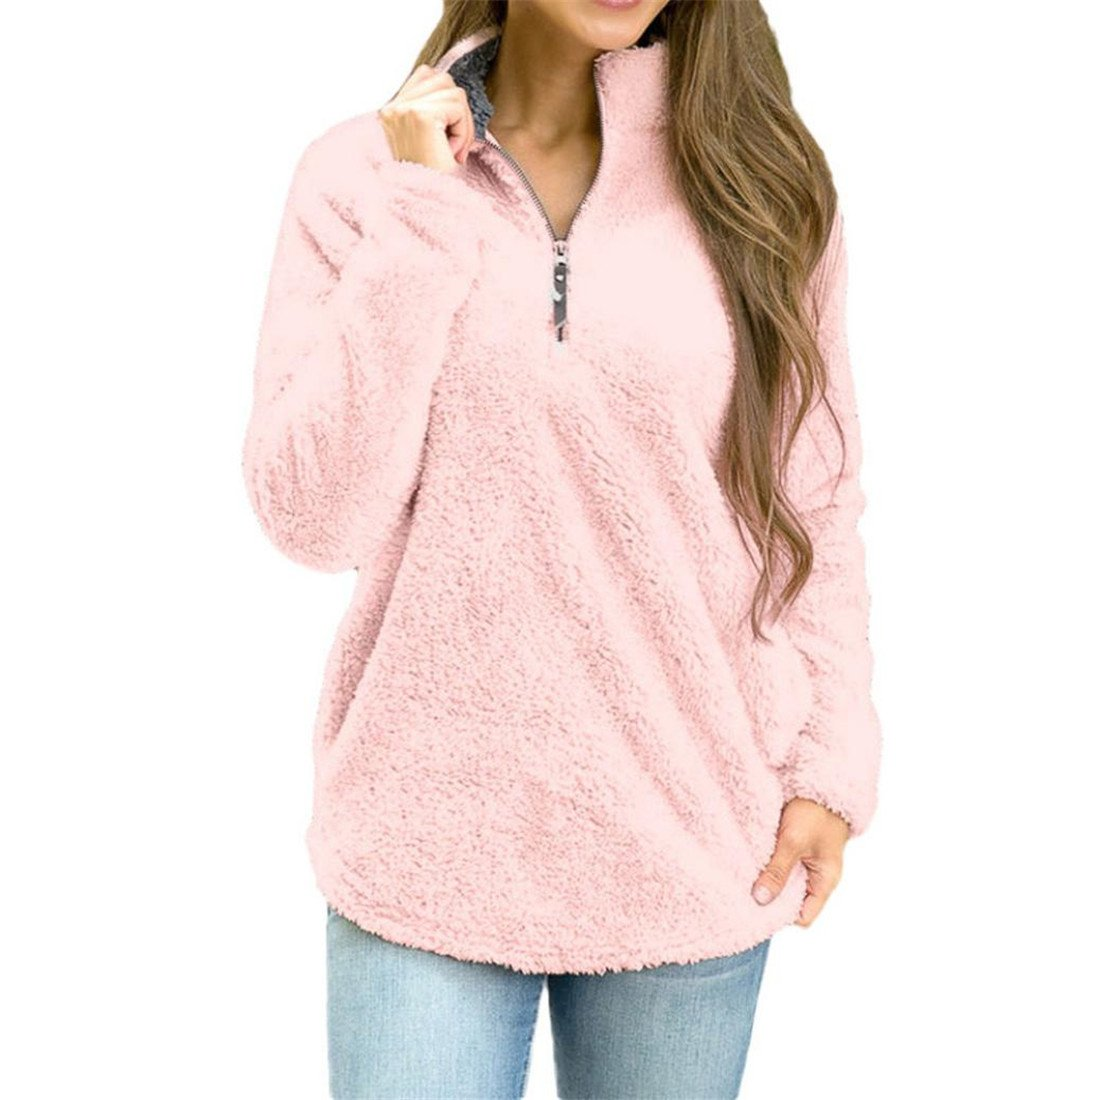 Damen Pullover Btruely Frau Herbst Winter Warm Sweatshirt Mode Langarm Zipper Fleece Pullover